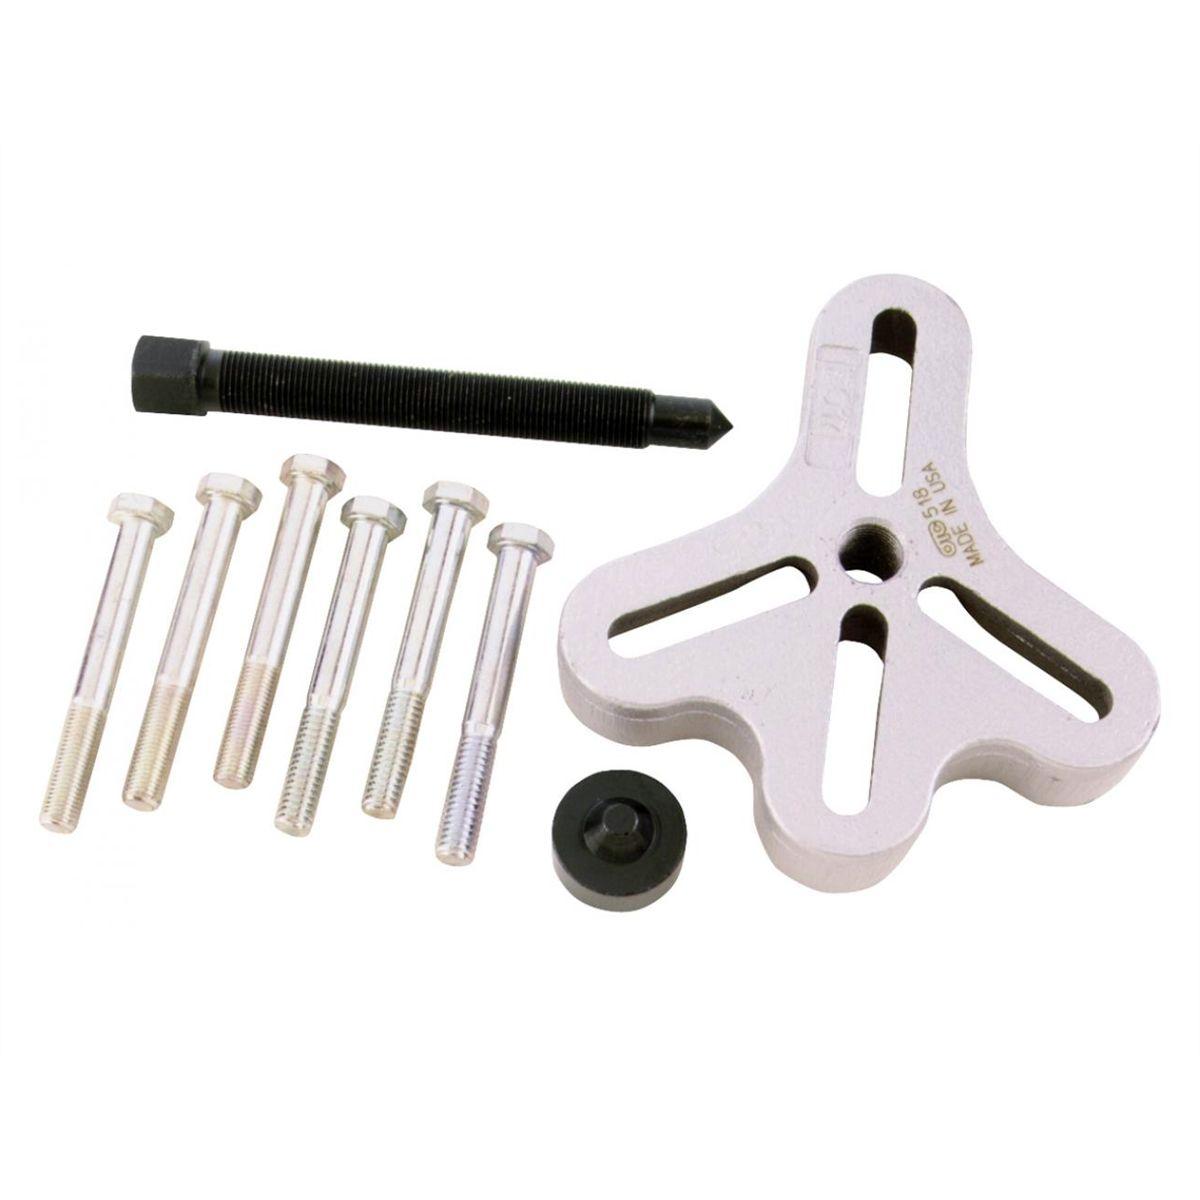 Otc Puller Parts : Otc flange type puller d l a